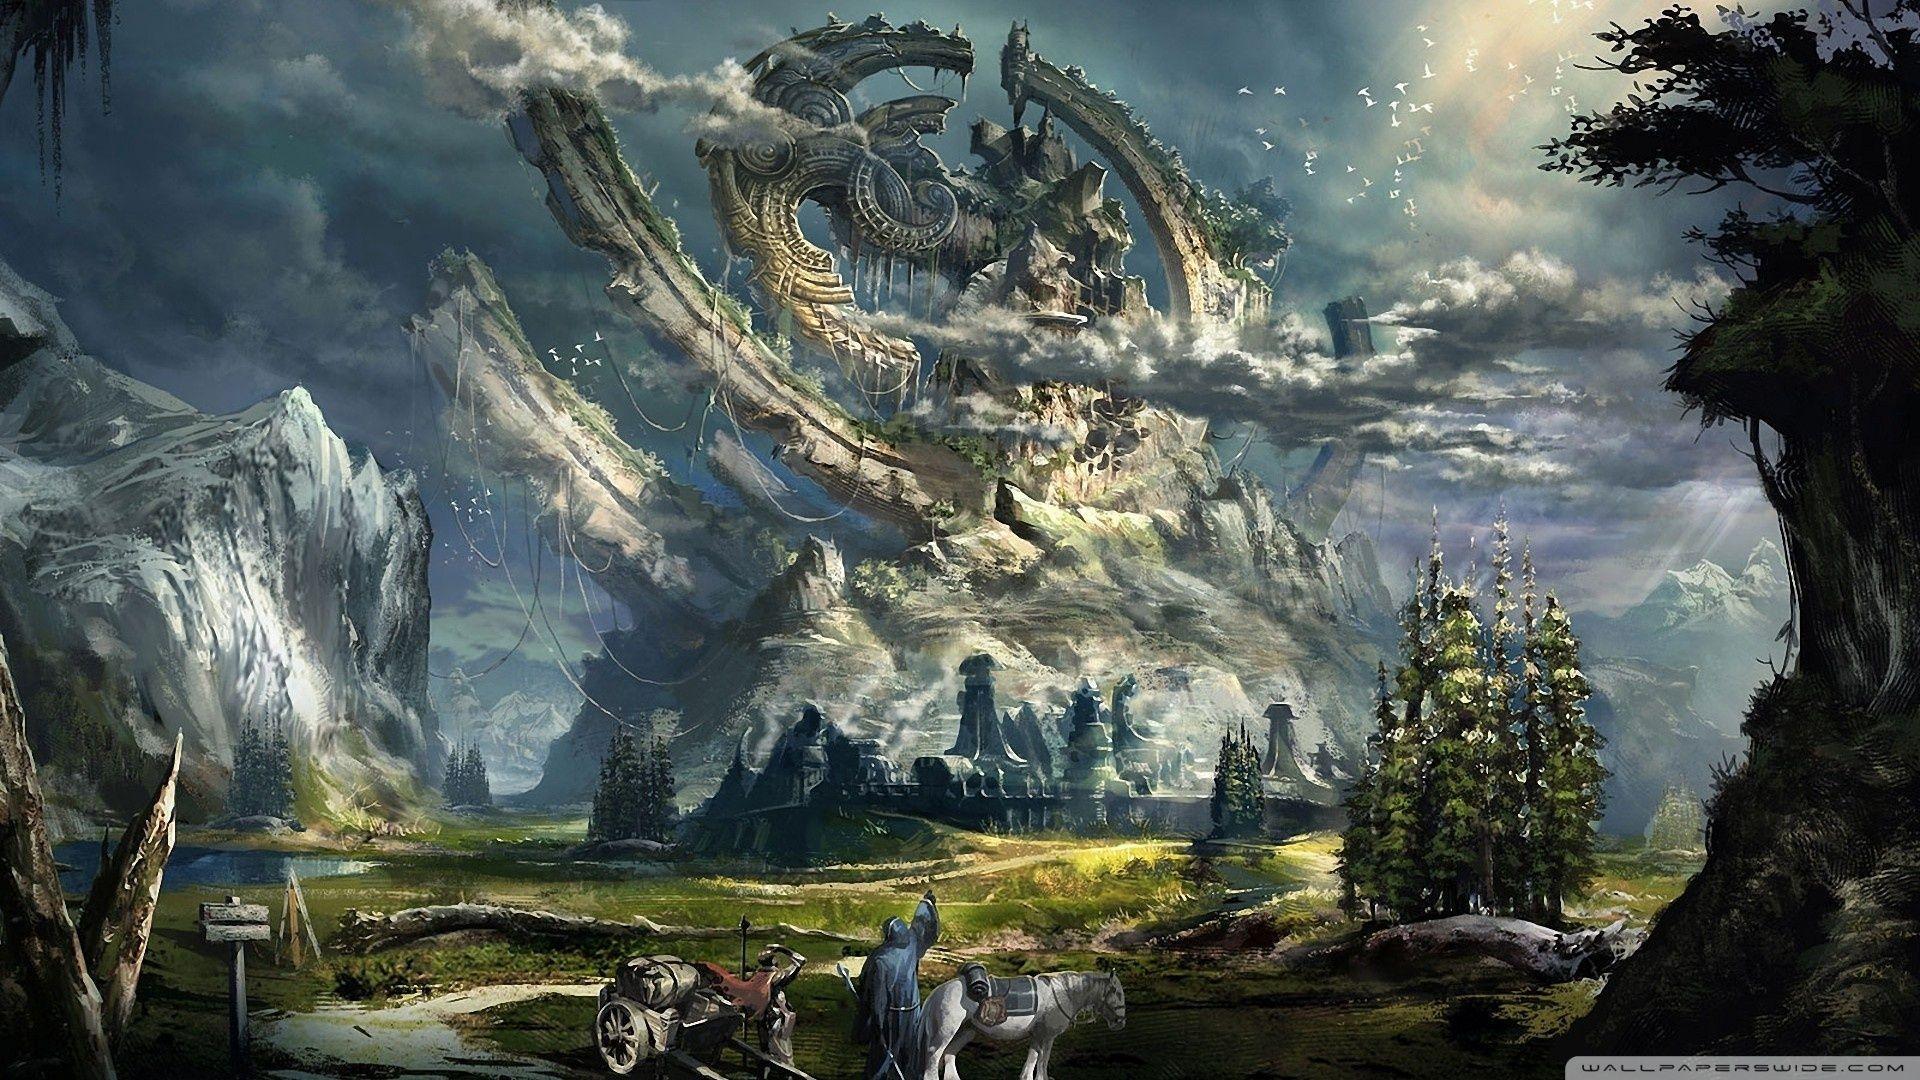 Mystical Wallpapers - Wallpaper Cave